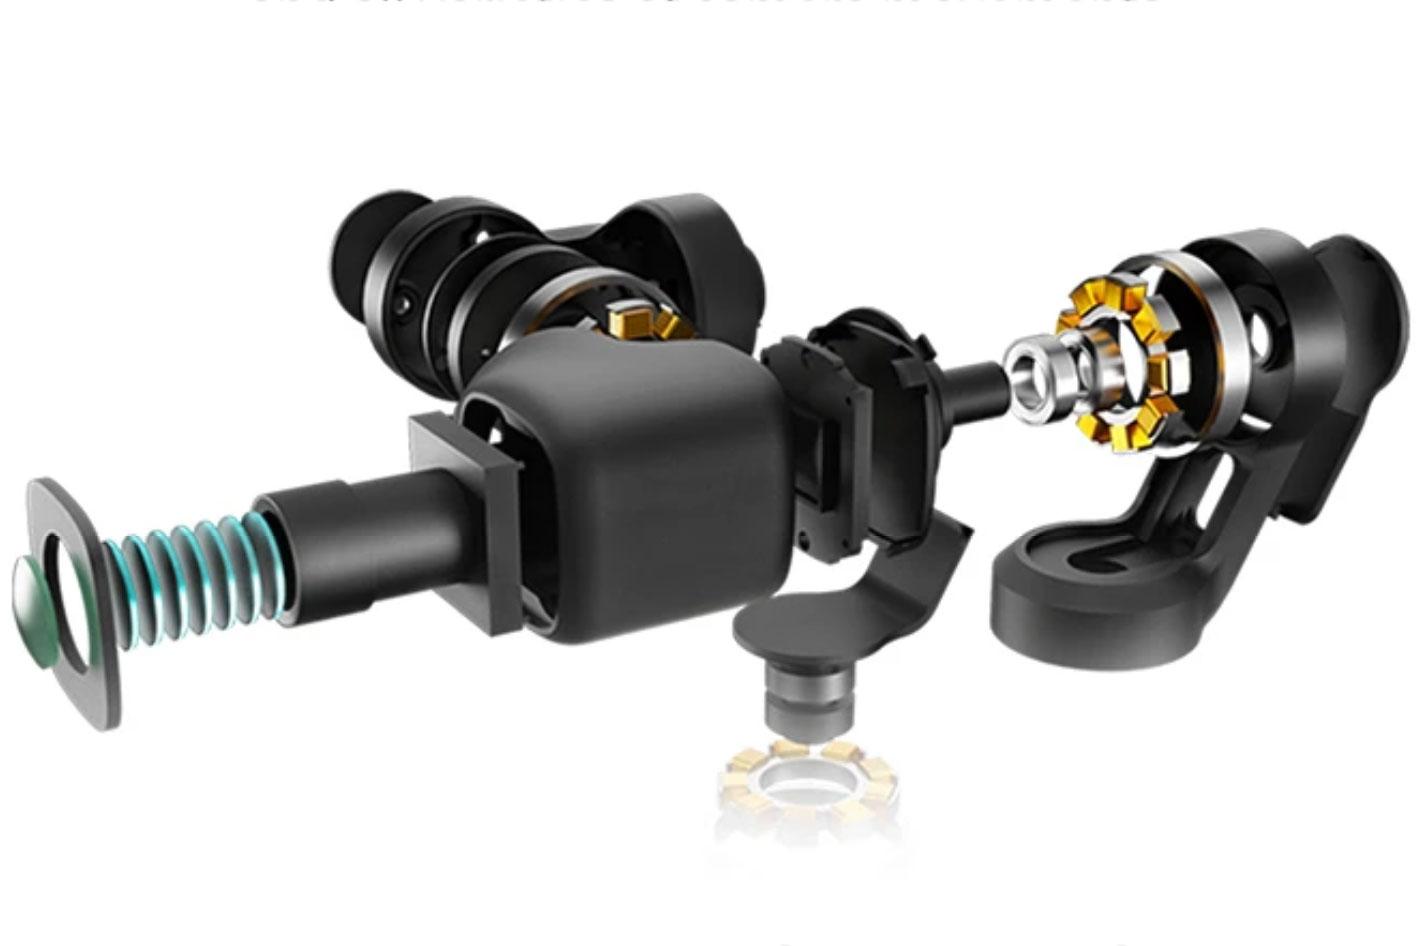 FeiyuPocket 2S: world's first detachable gimbal camera